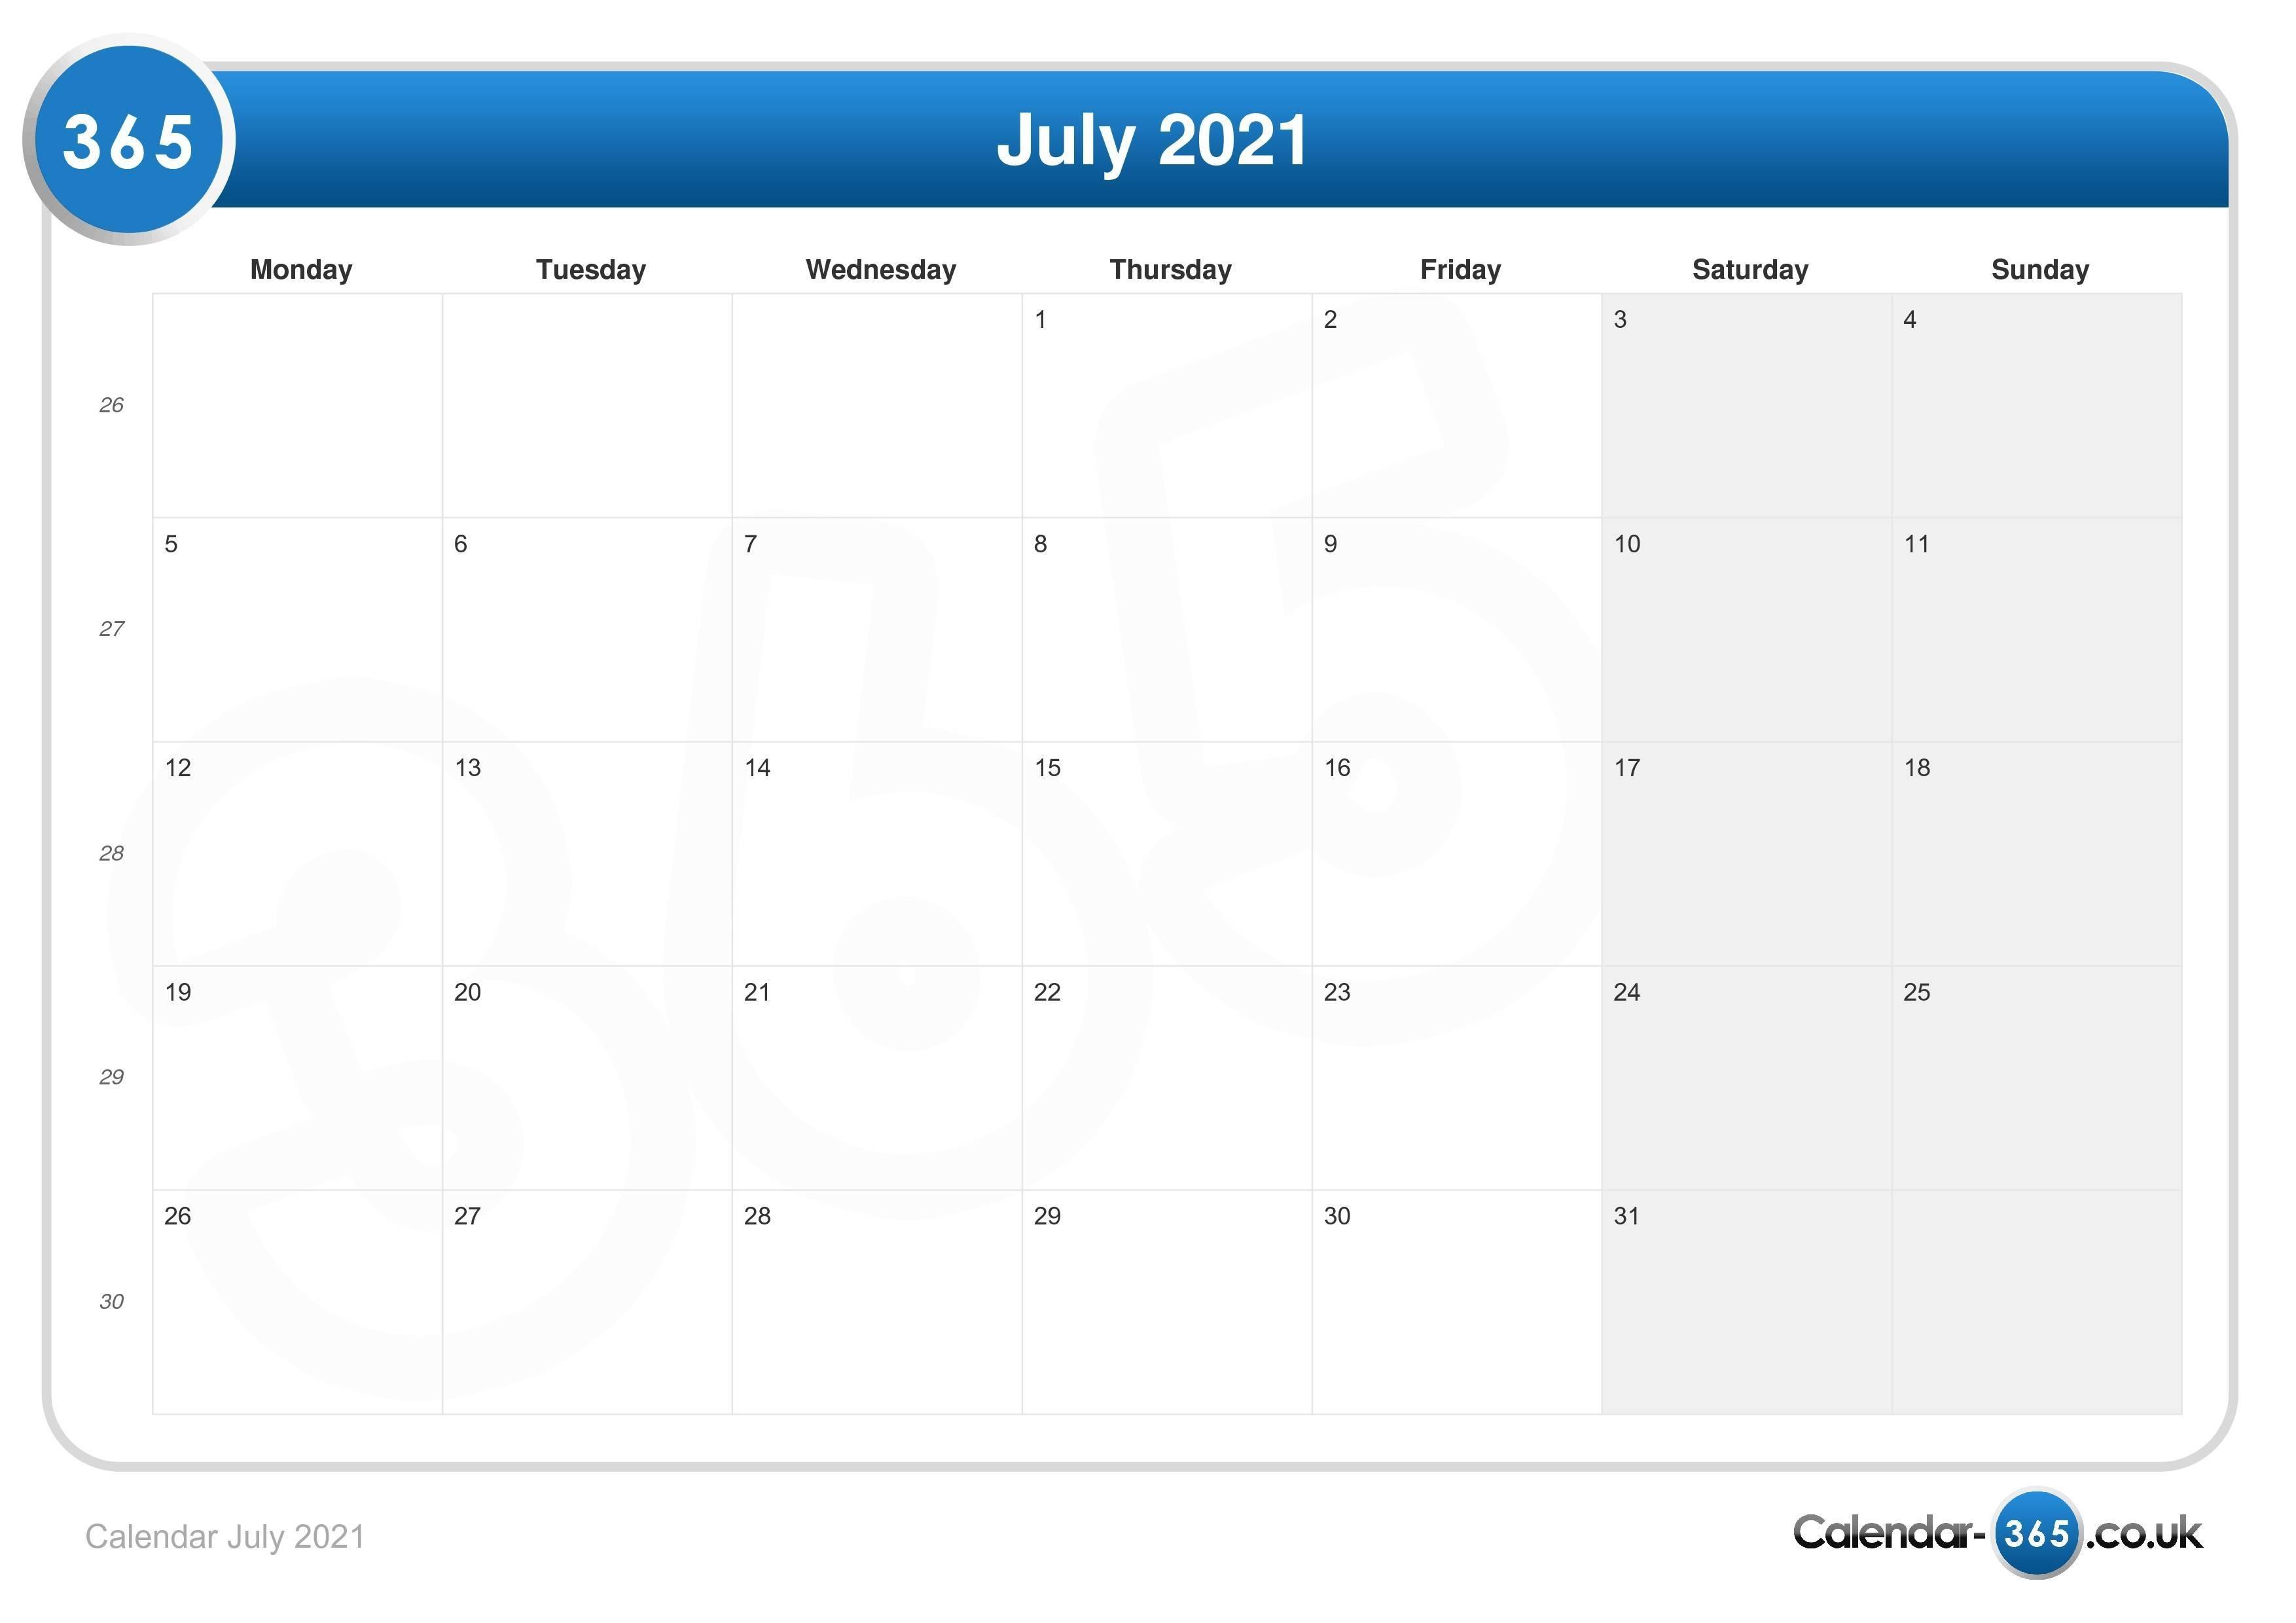 Calendar July 2021 February To July 2021 Calendar